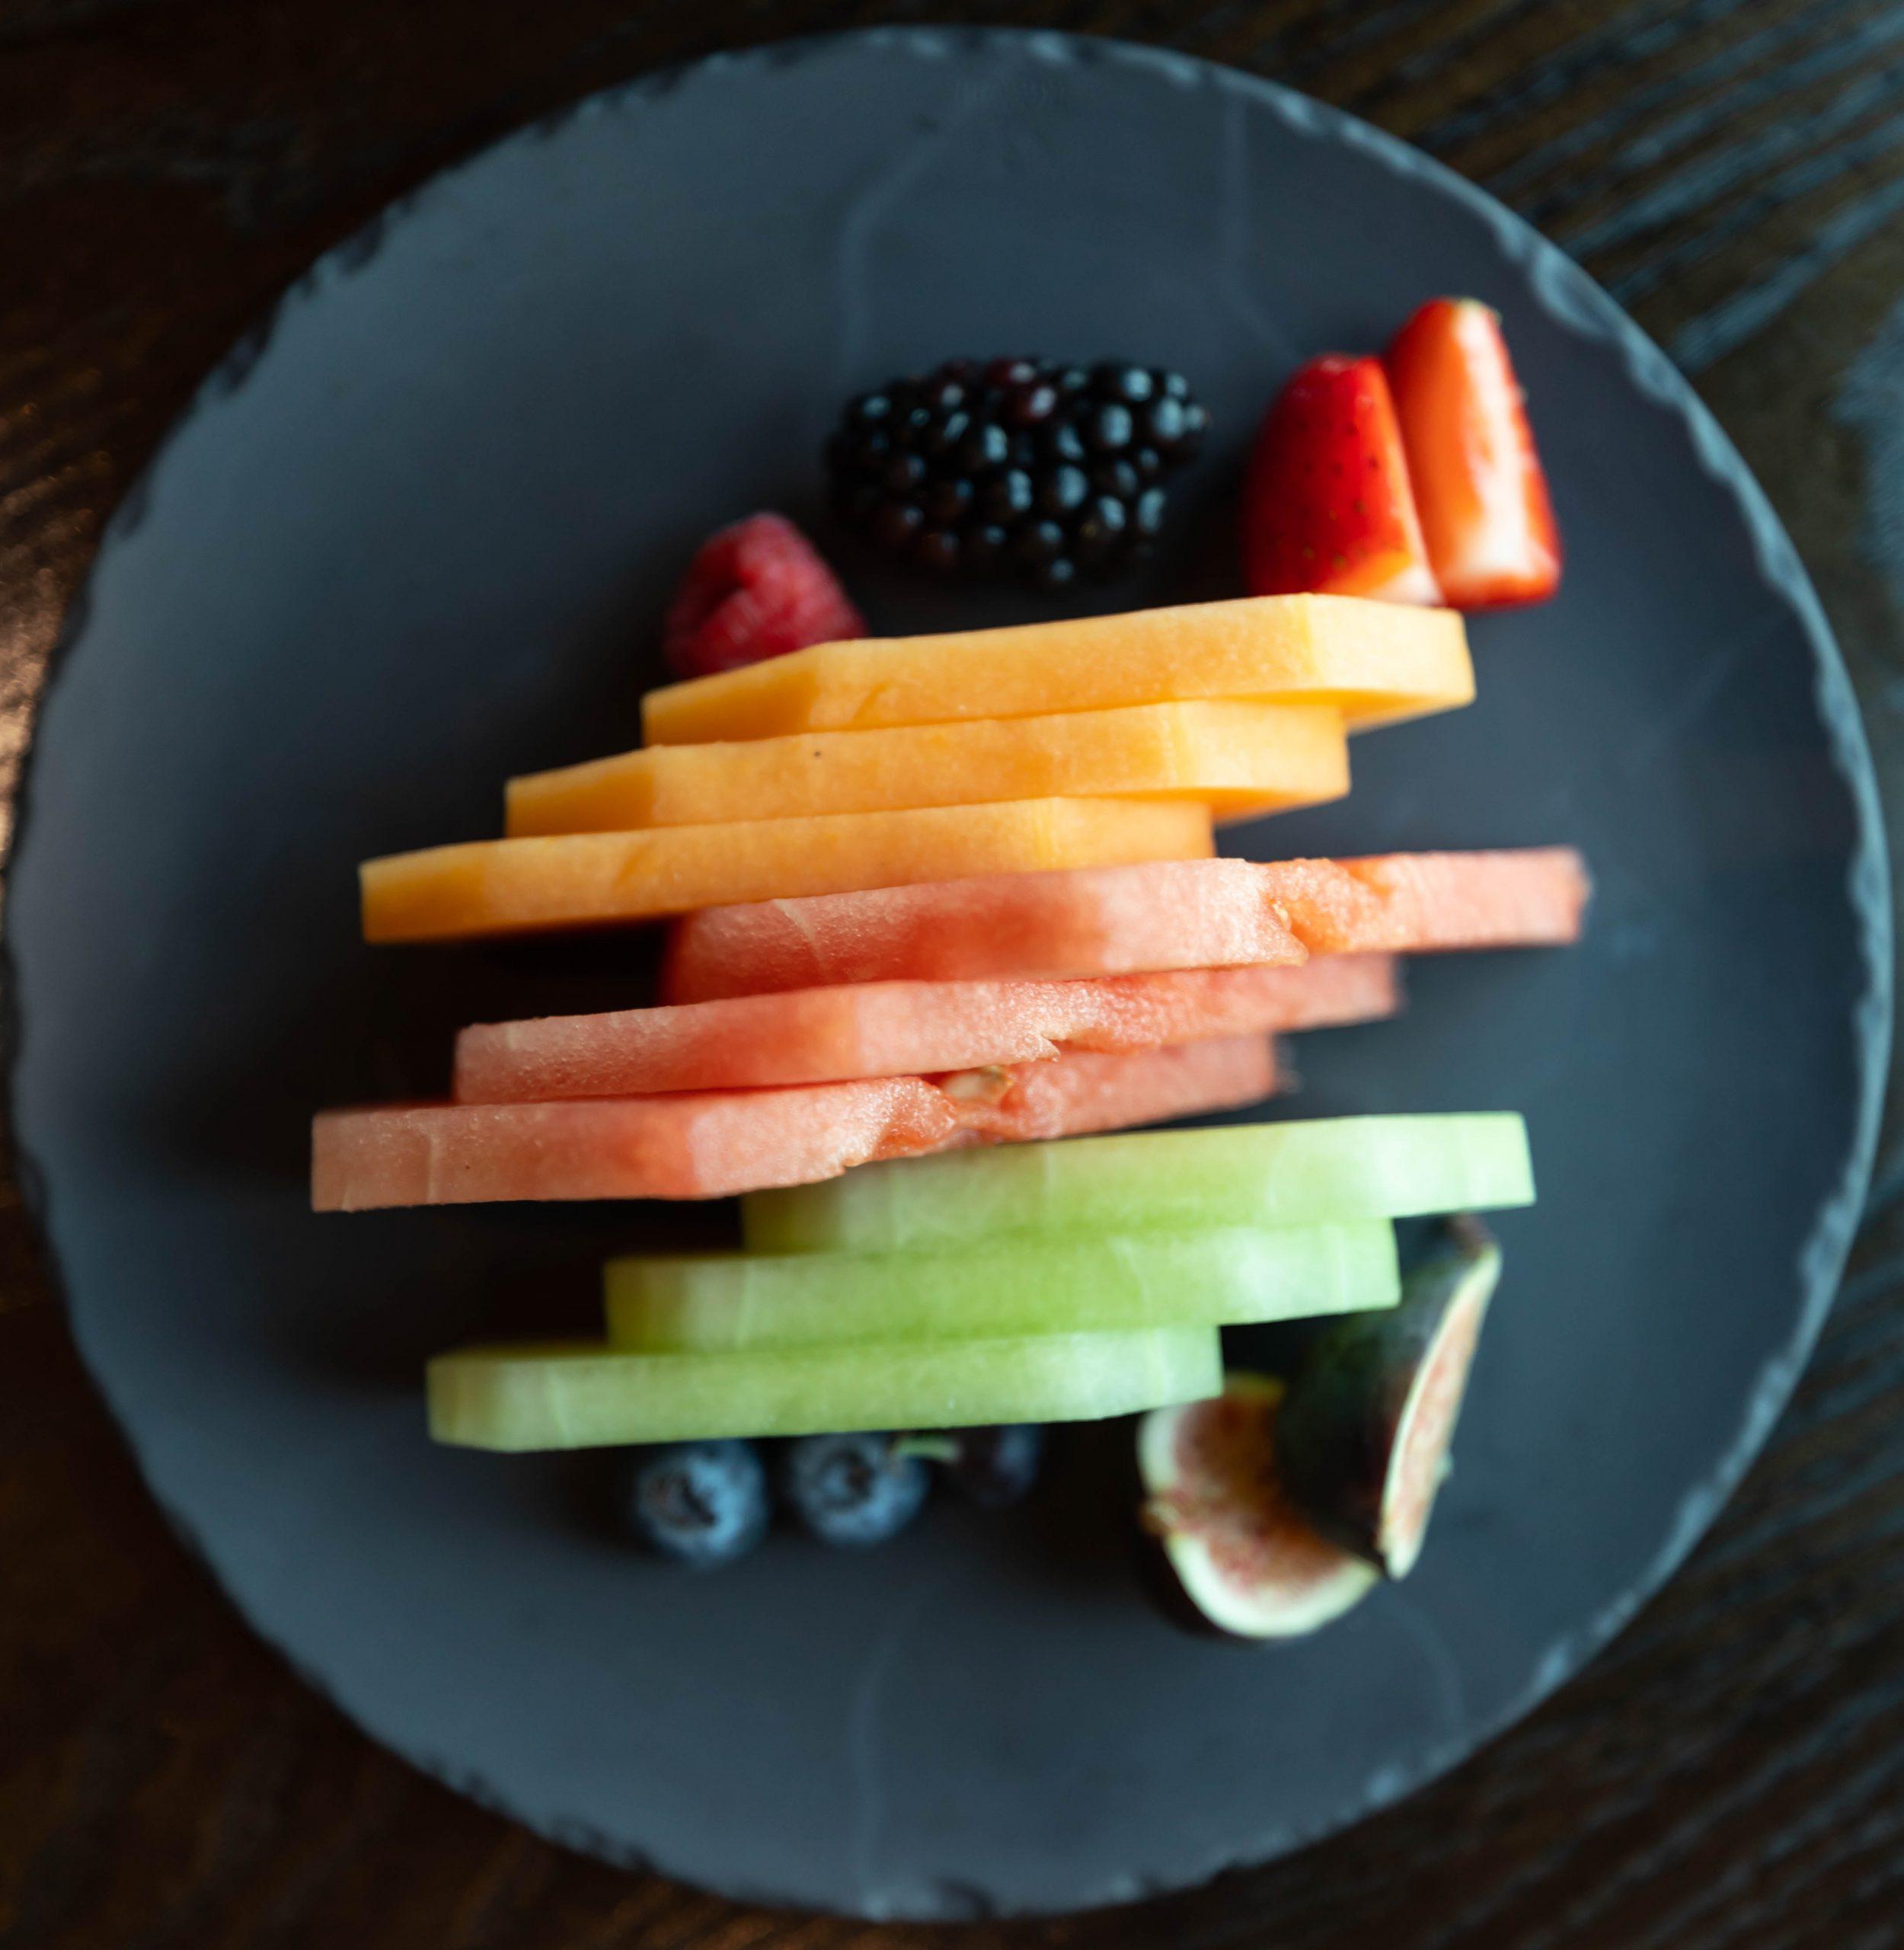 Goldfinch Tavern Fruit Platter Vegan Meal Four Seasons Hotel Seattle Washington by Annie Fairfax for AnnieFairfax.com Luxury Hotels of the World Pacific Northwest Luxury 5-Star Hotels